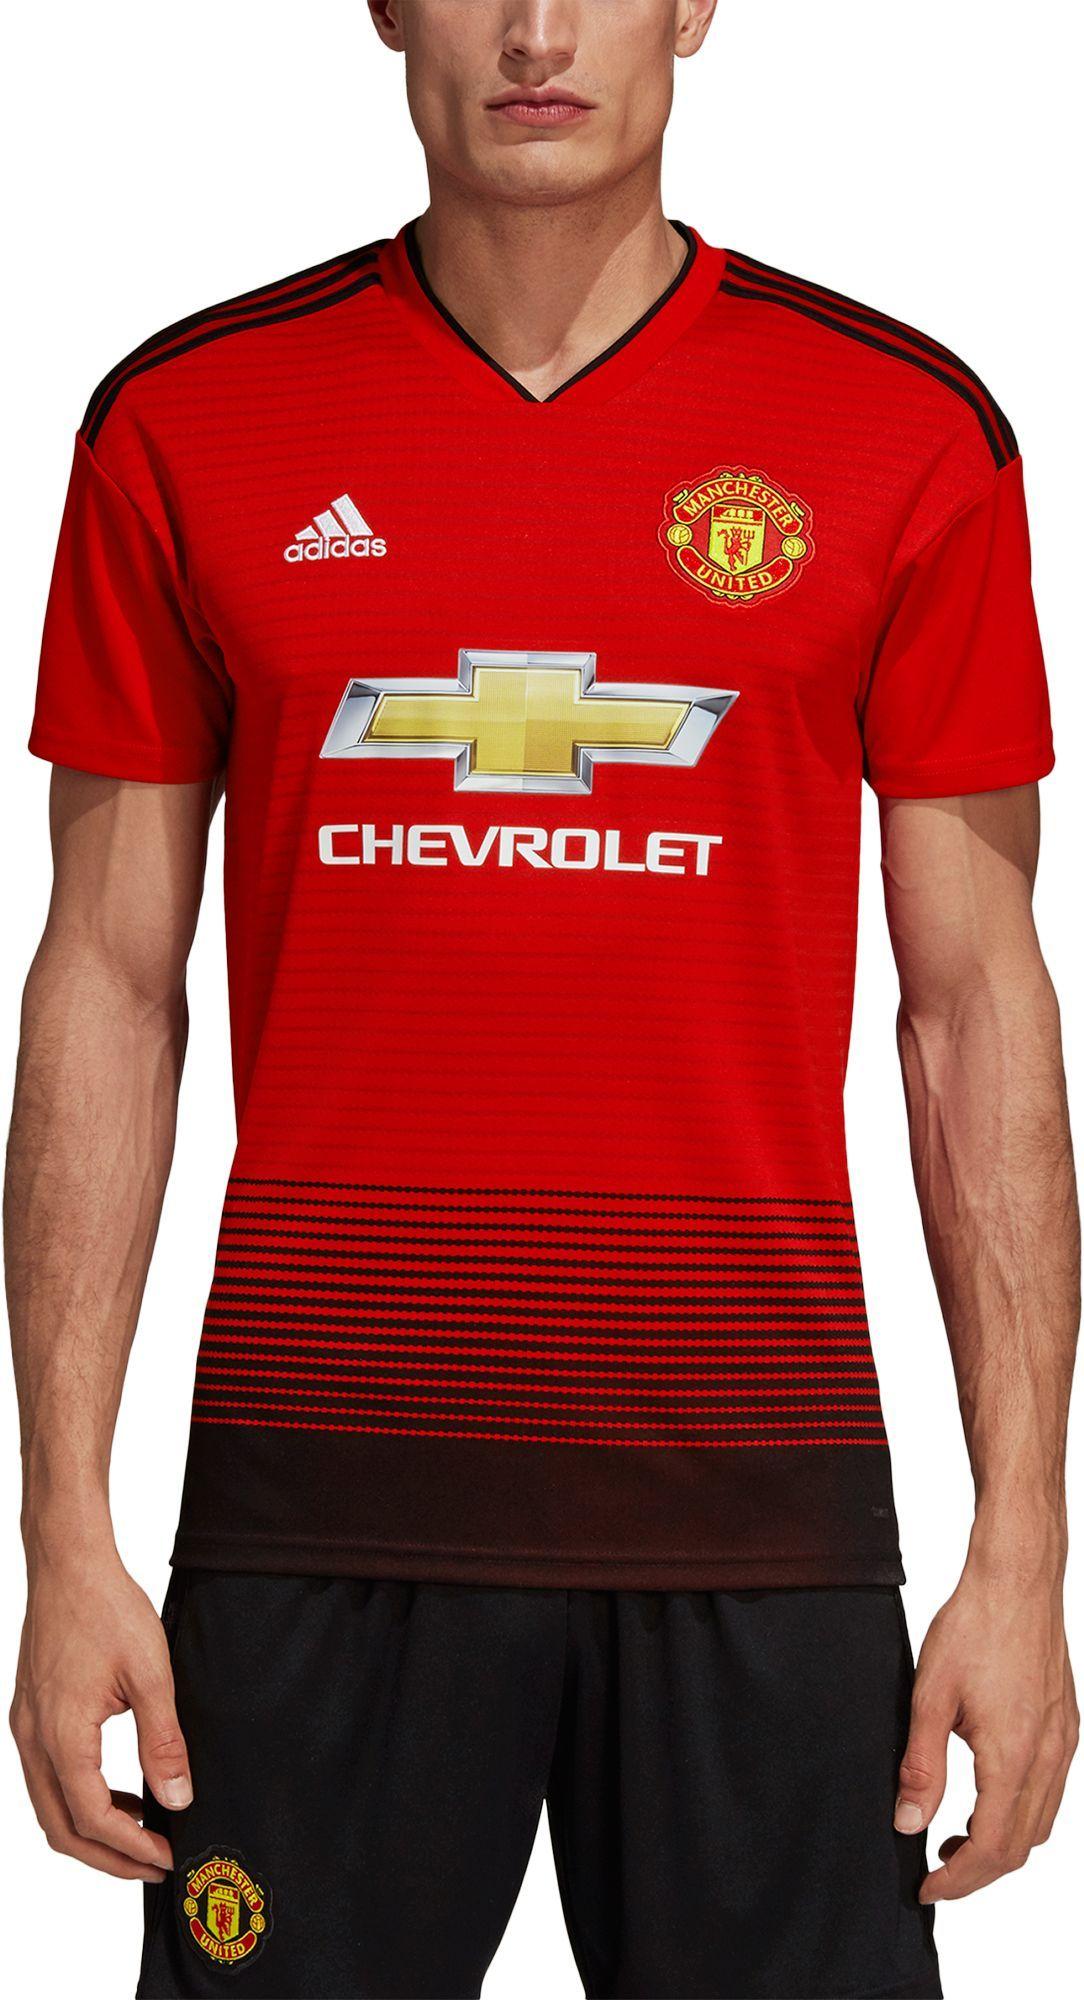 low priced 43d4a d990b adidas Men's Manchester United 2018 Stadium Home Replica ...